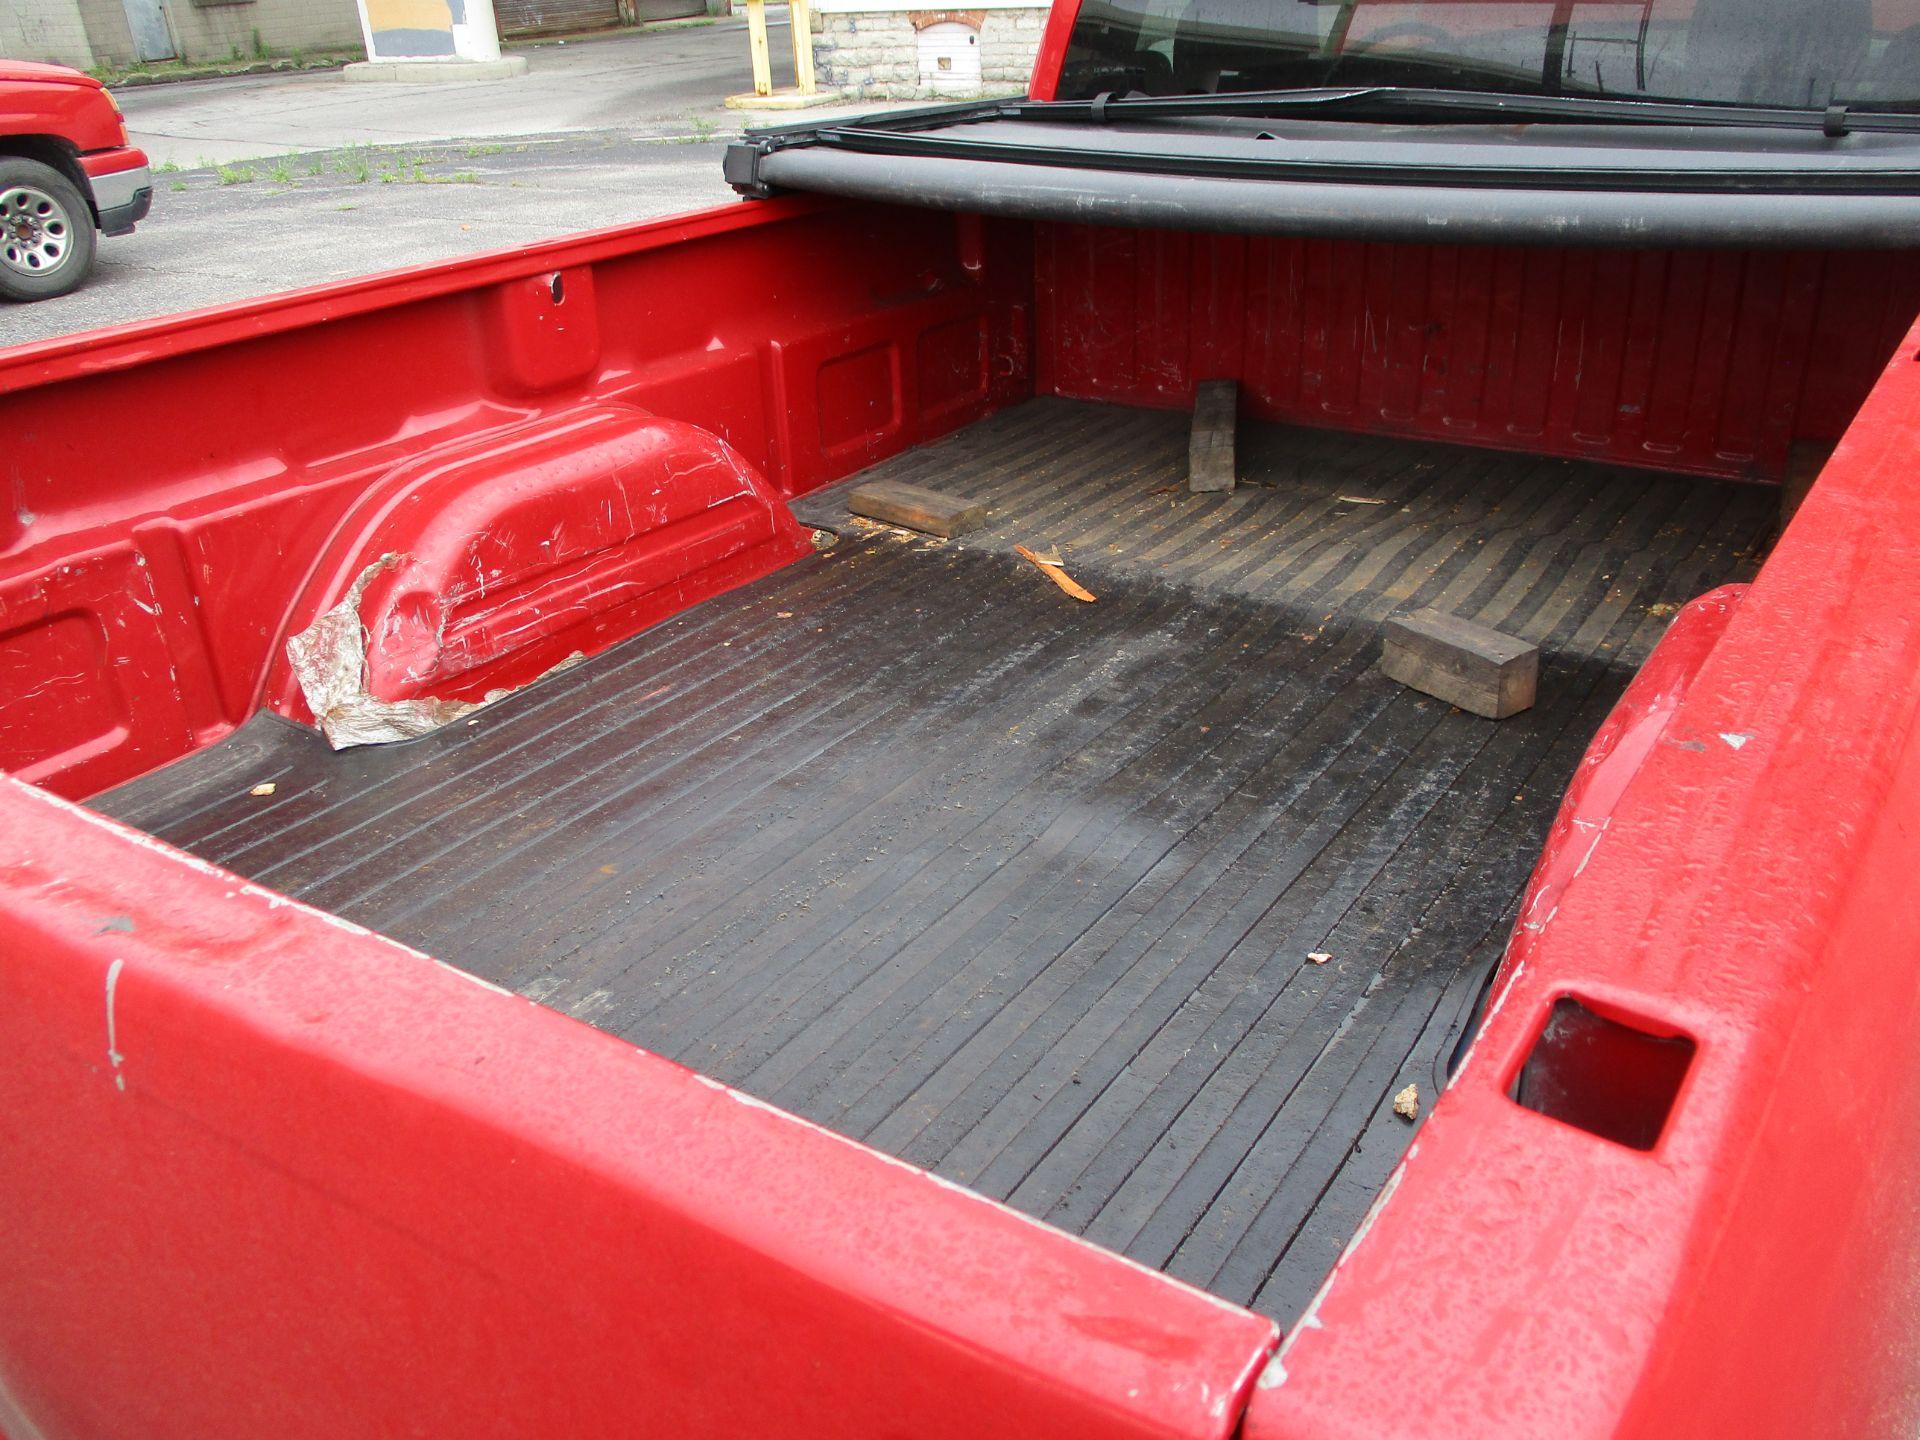 2006 Chevrolet Silverado 1500 LT Pickup, VIN 1GCEC14V96E251510, Regular Cab, Automatic, AC, 8' - Image 19 of 21